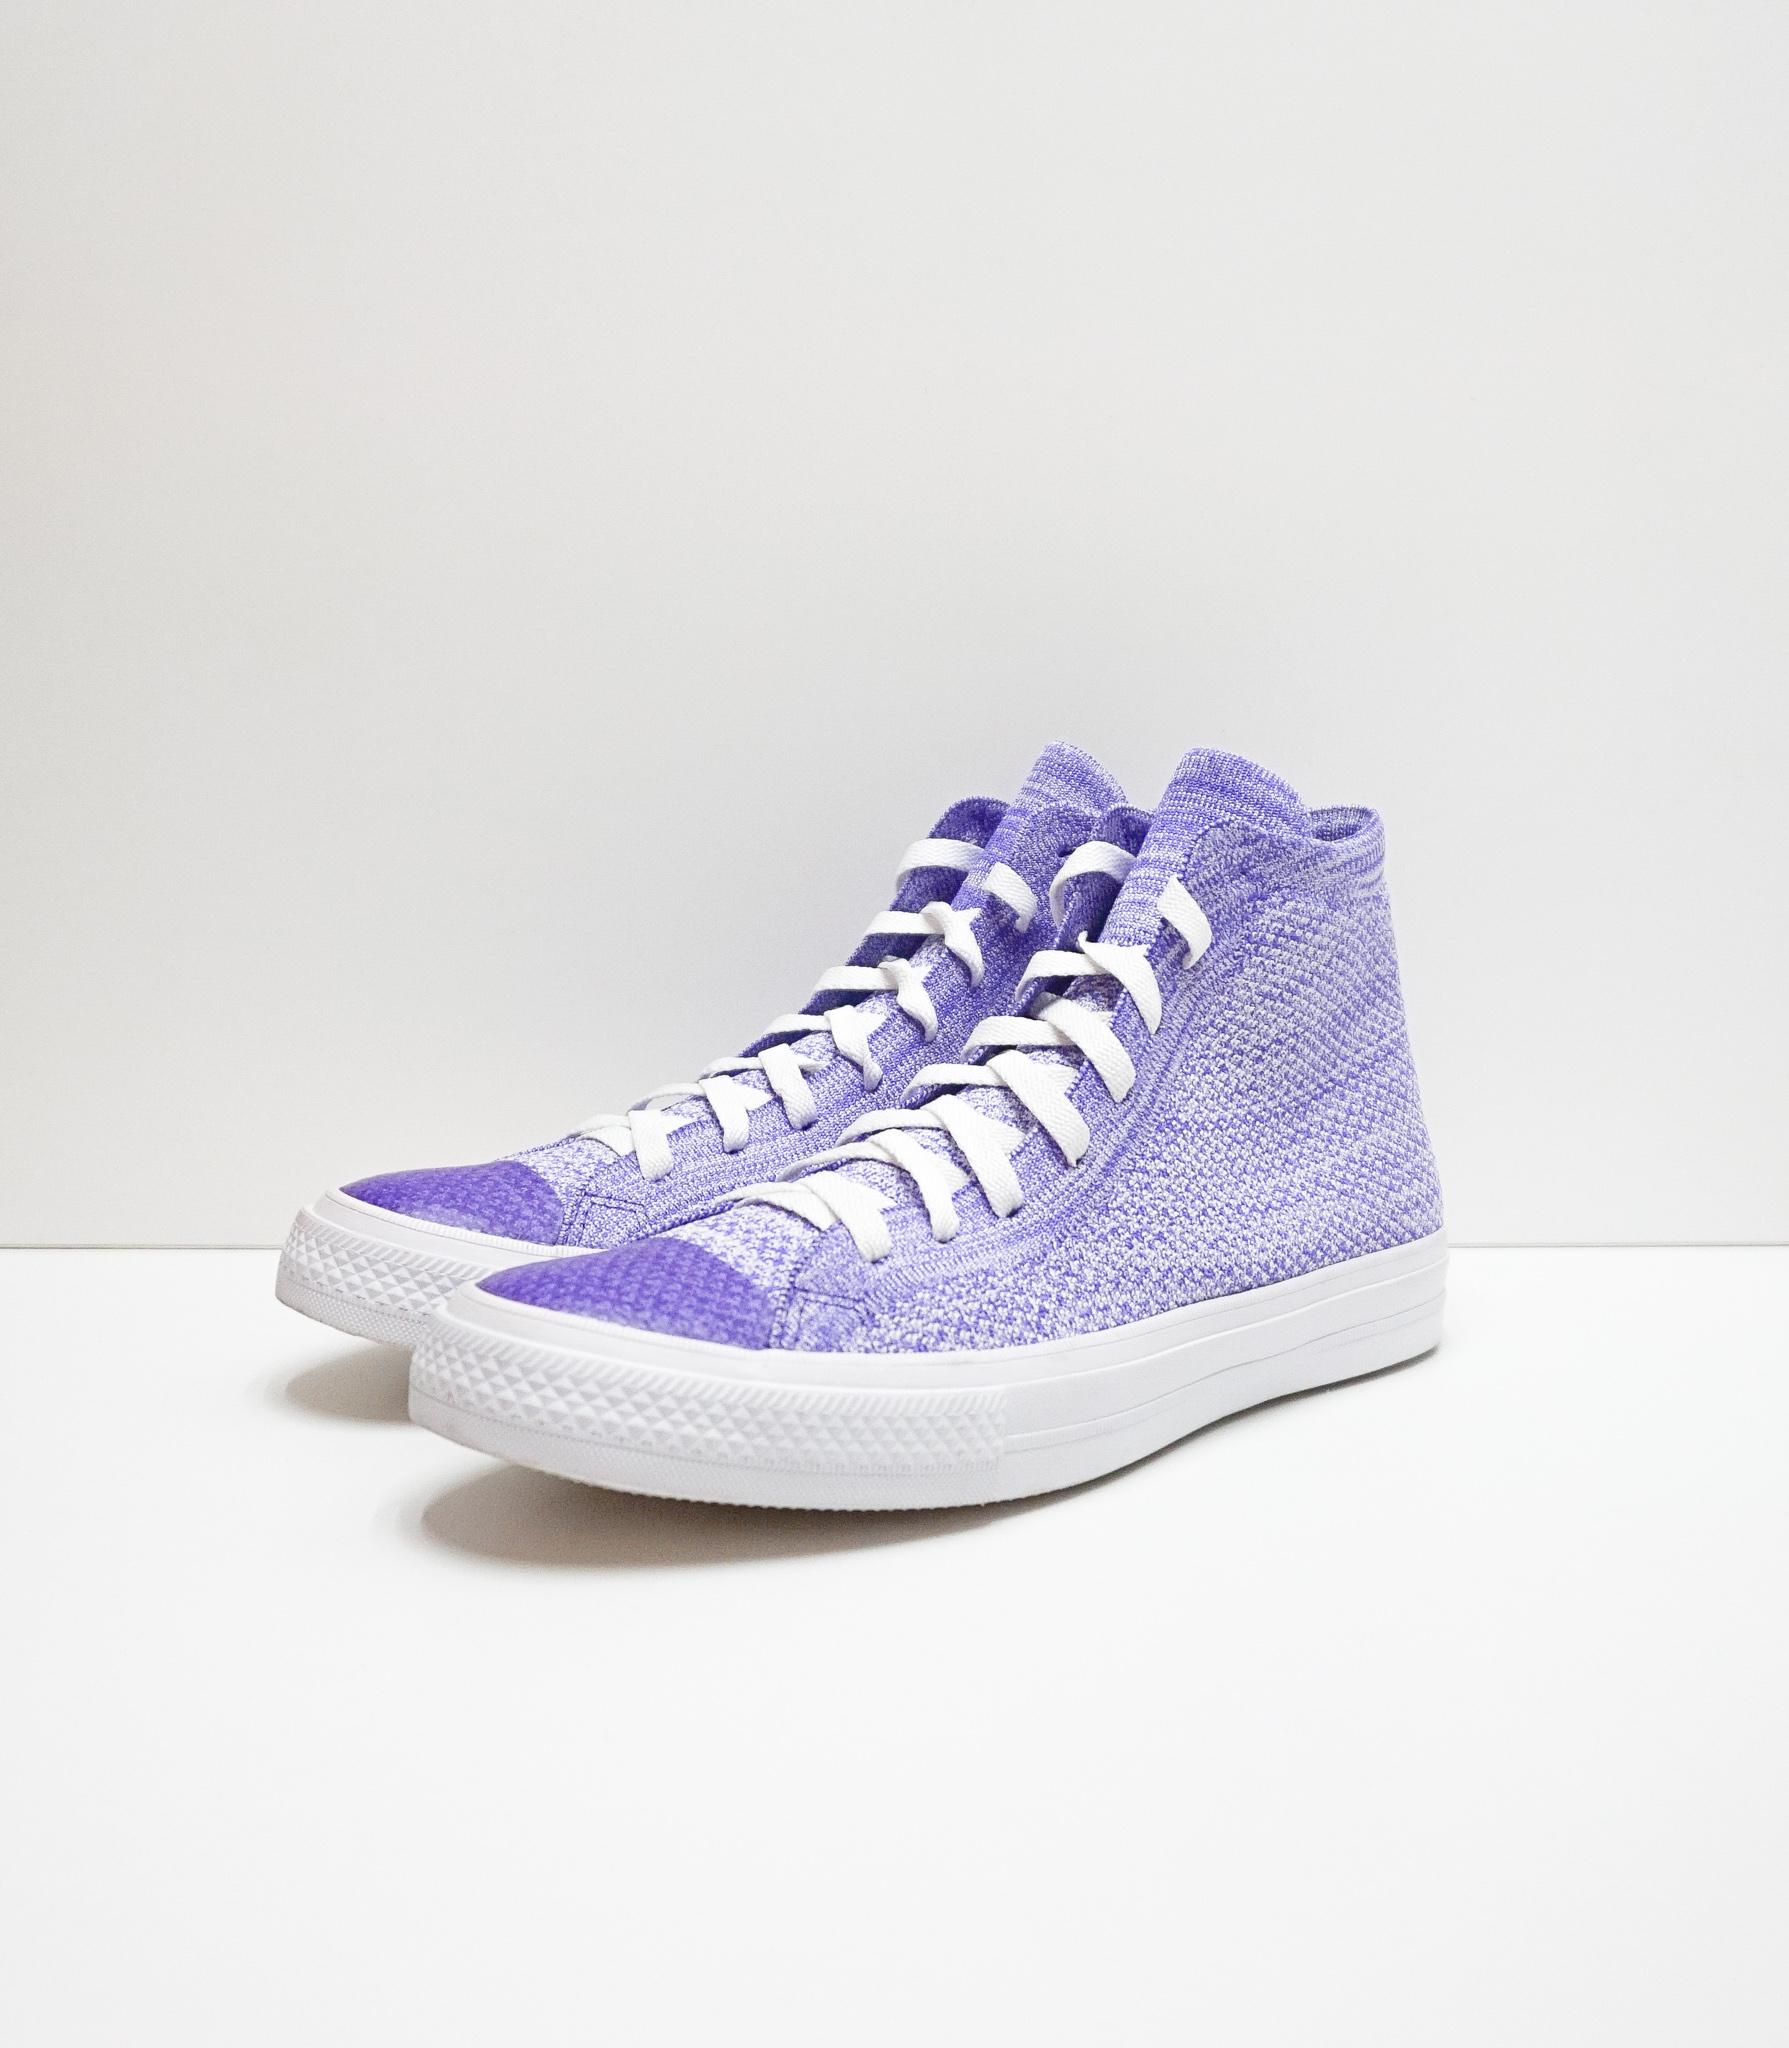 Nike x Chuck Taylor All Star Flyknit High 'Hyper Grape'